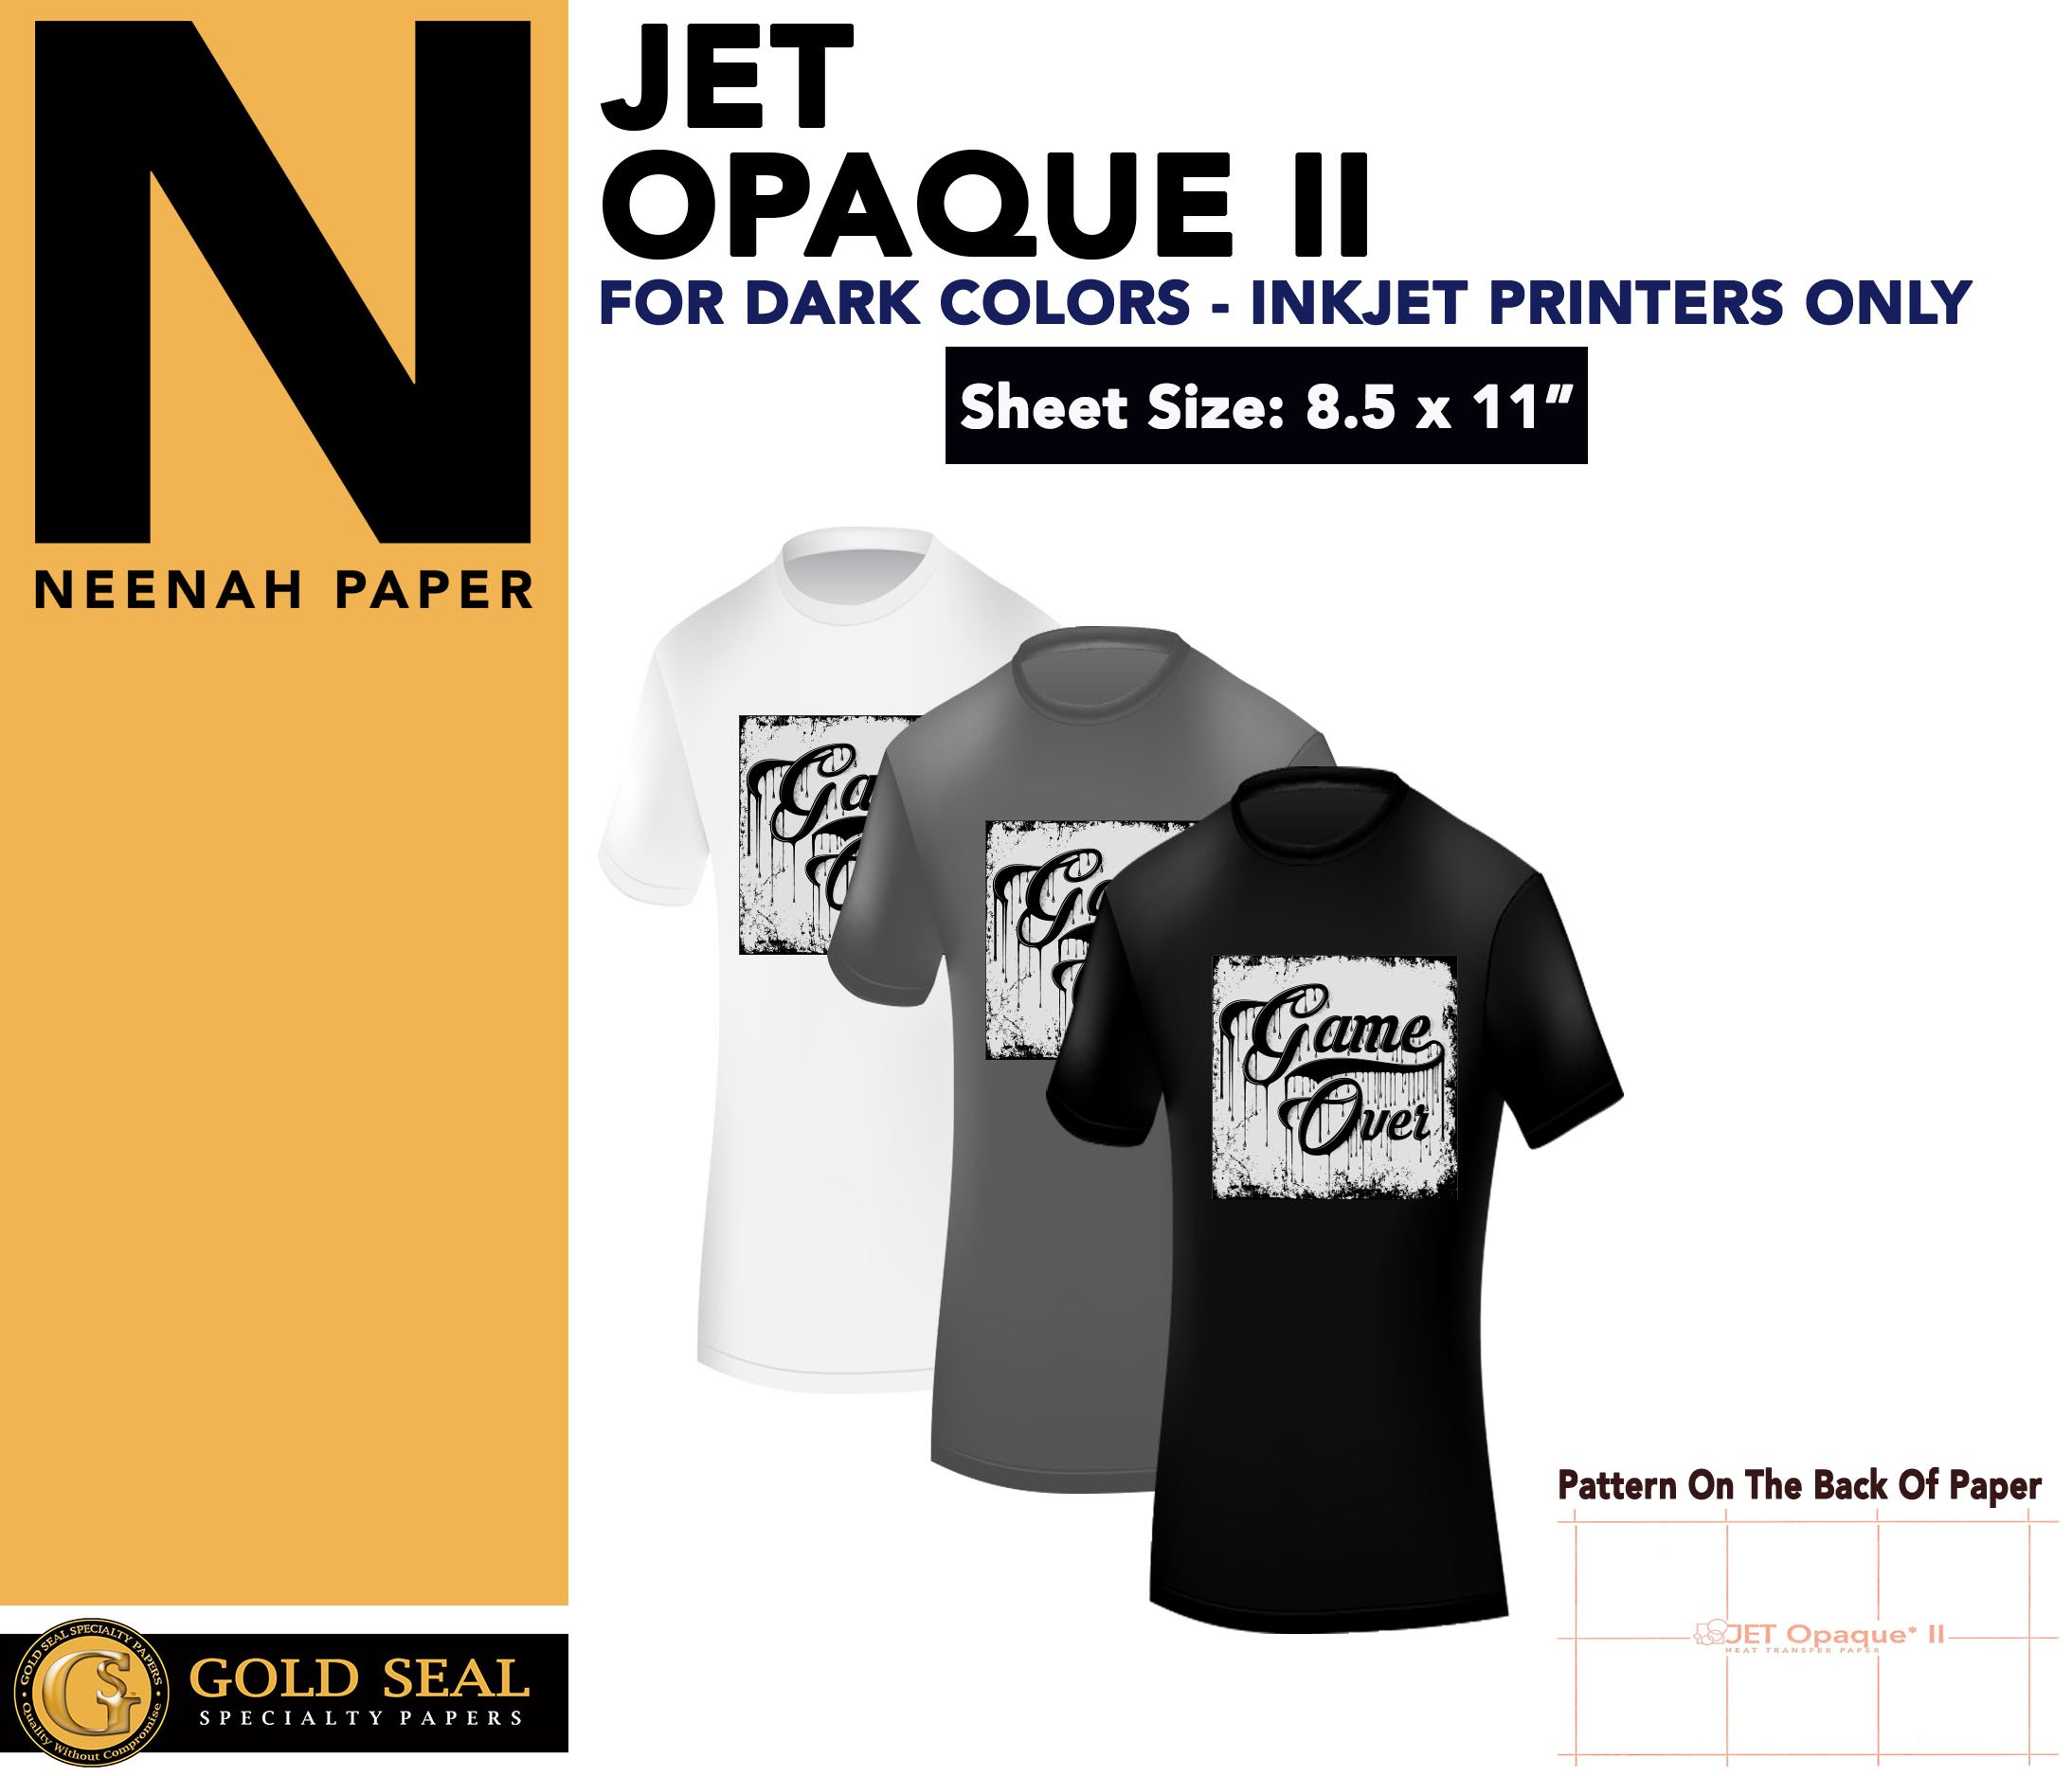 IRON ON HEAT TRANSFER PAPER JET OPAQUE II 8.5 x 11'' CUSTOM PACK 500 SHEETS